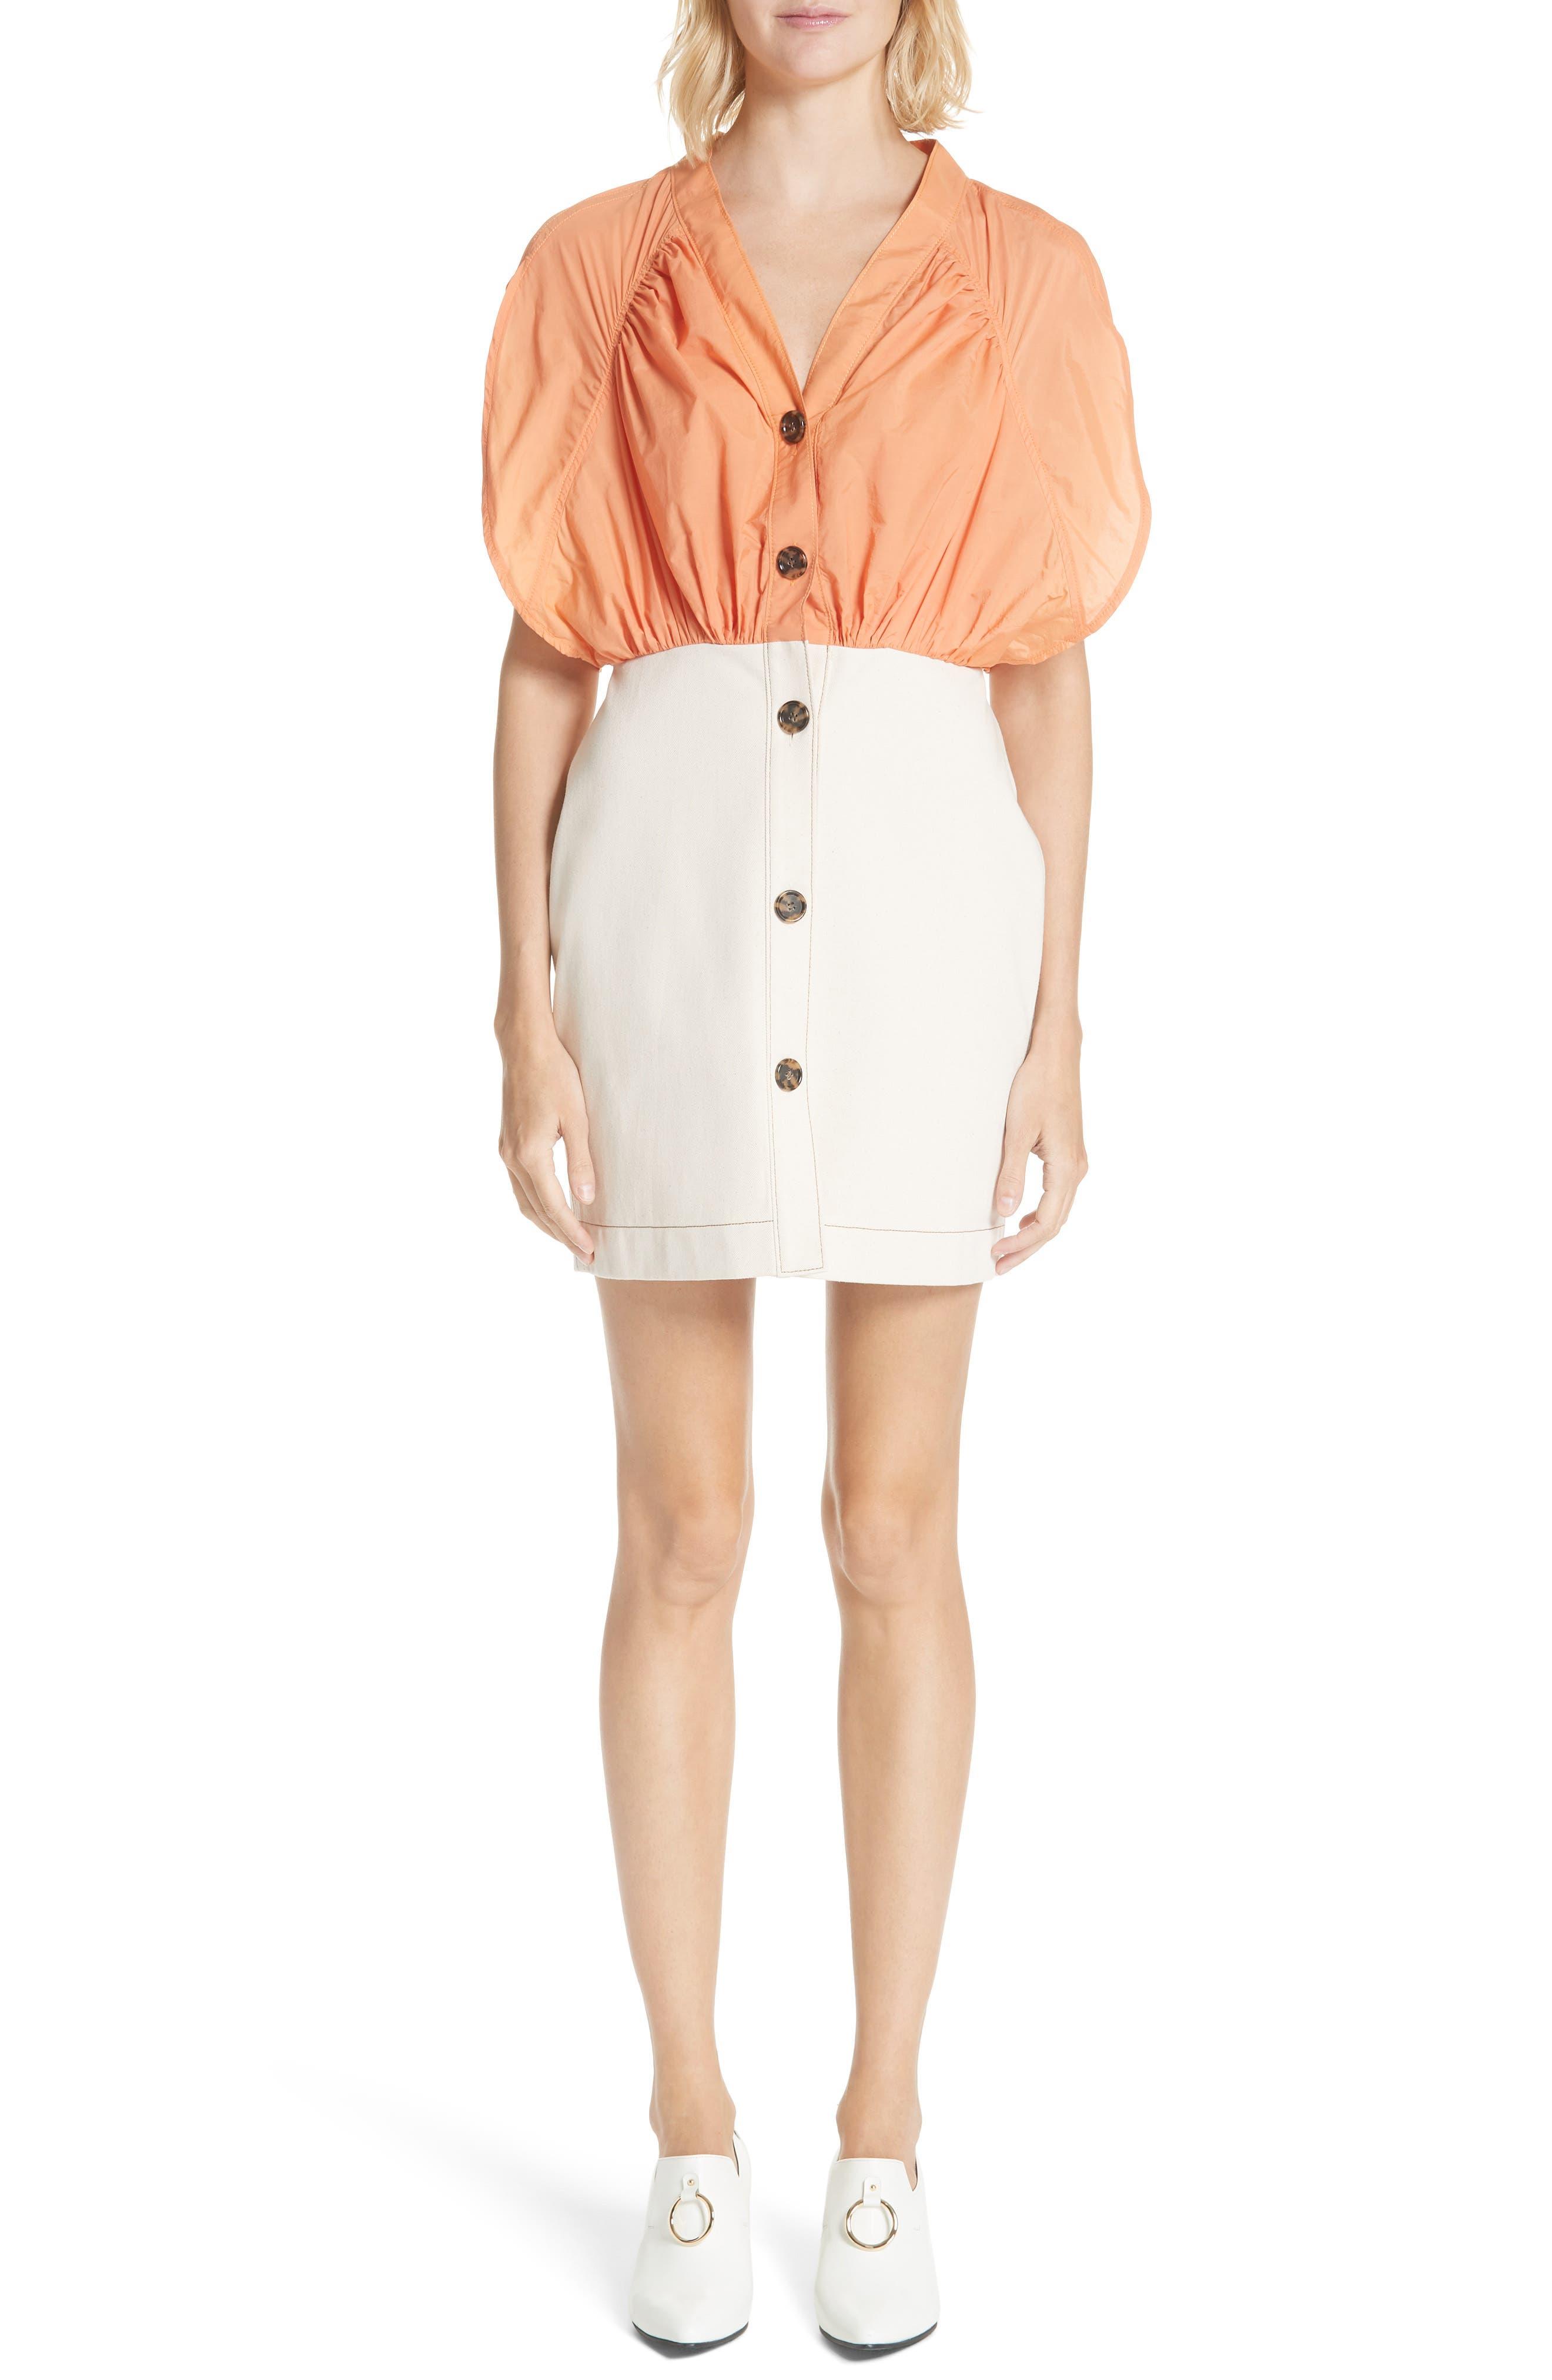 Yana Bicolor Dress,                             Main thumbnail 1, color,                             Cotton Orange/ Denim Ecru